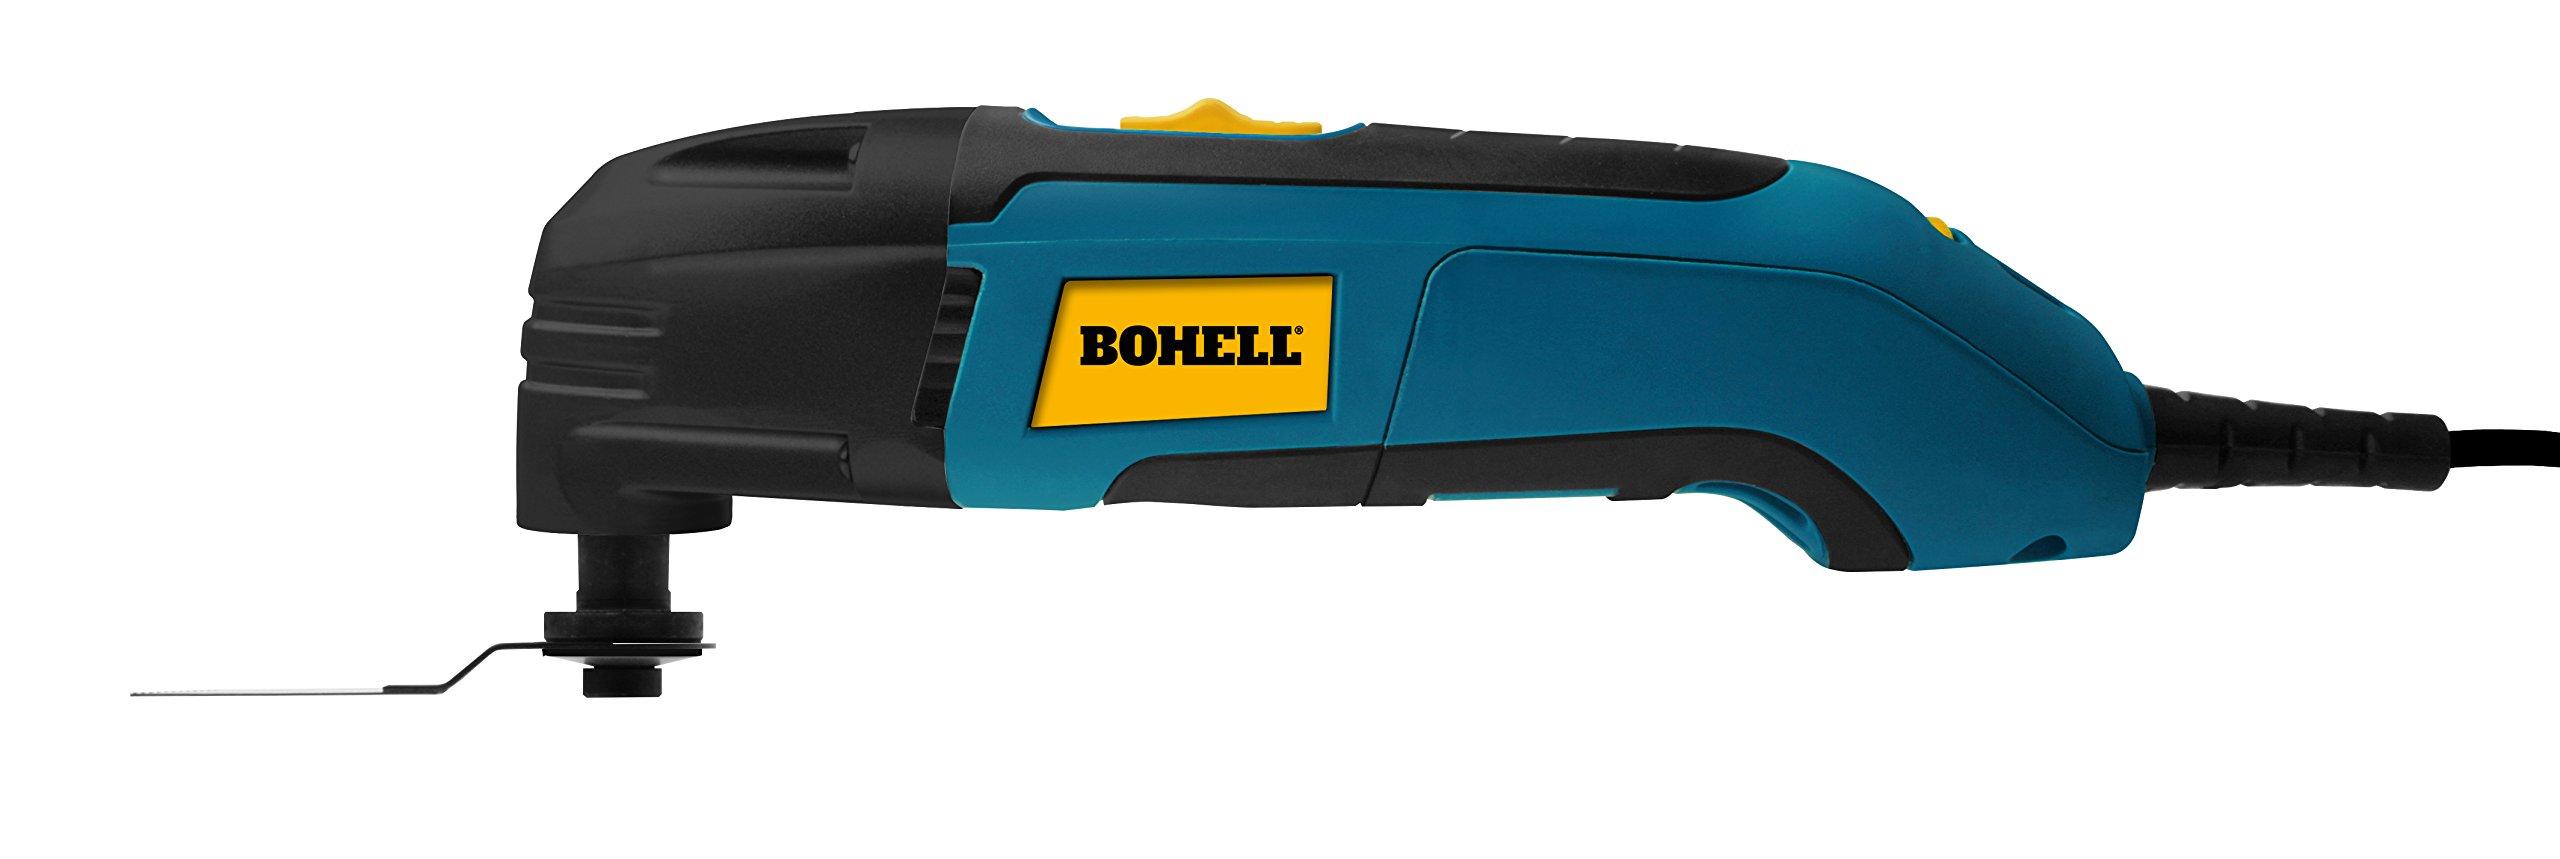 Bohell MF300 - Multiherramienta 300 W, rasca, lija y corta, velocidad regulable 15.000